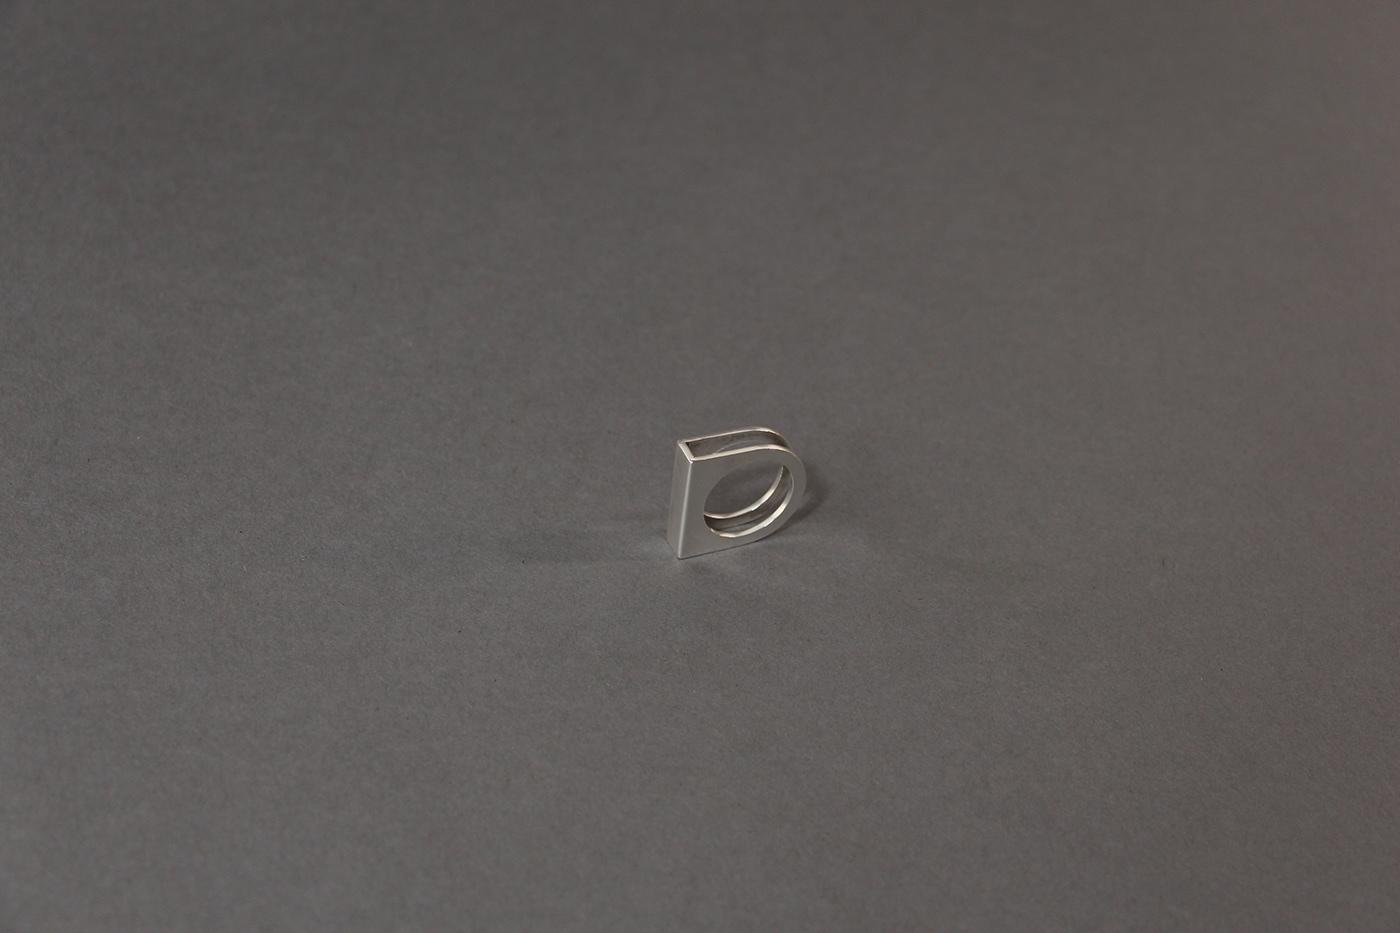 art bend craft goldsmithing handmade jewelry metal metalwork ring silver